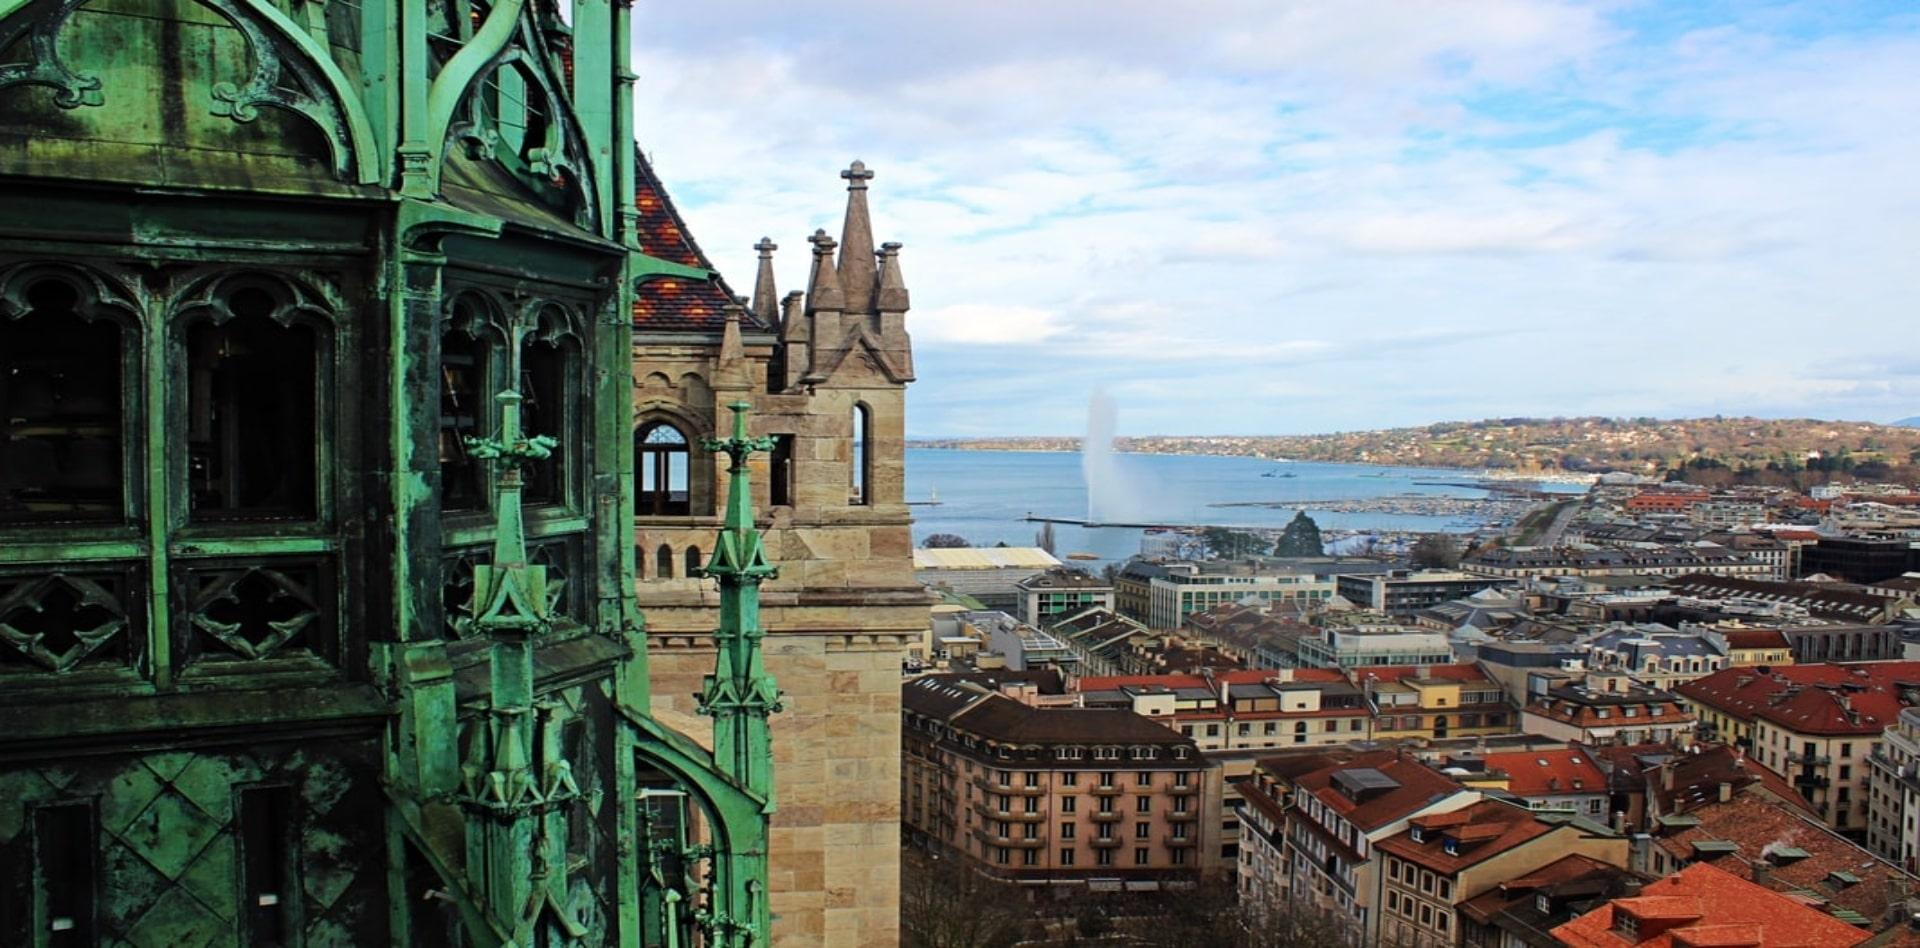 St Pierre Cathedral, Switzerland Sight